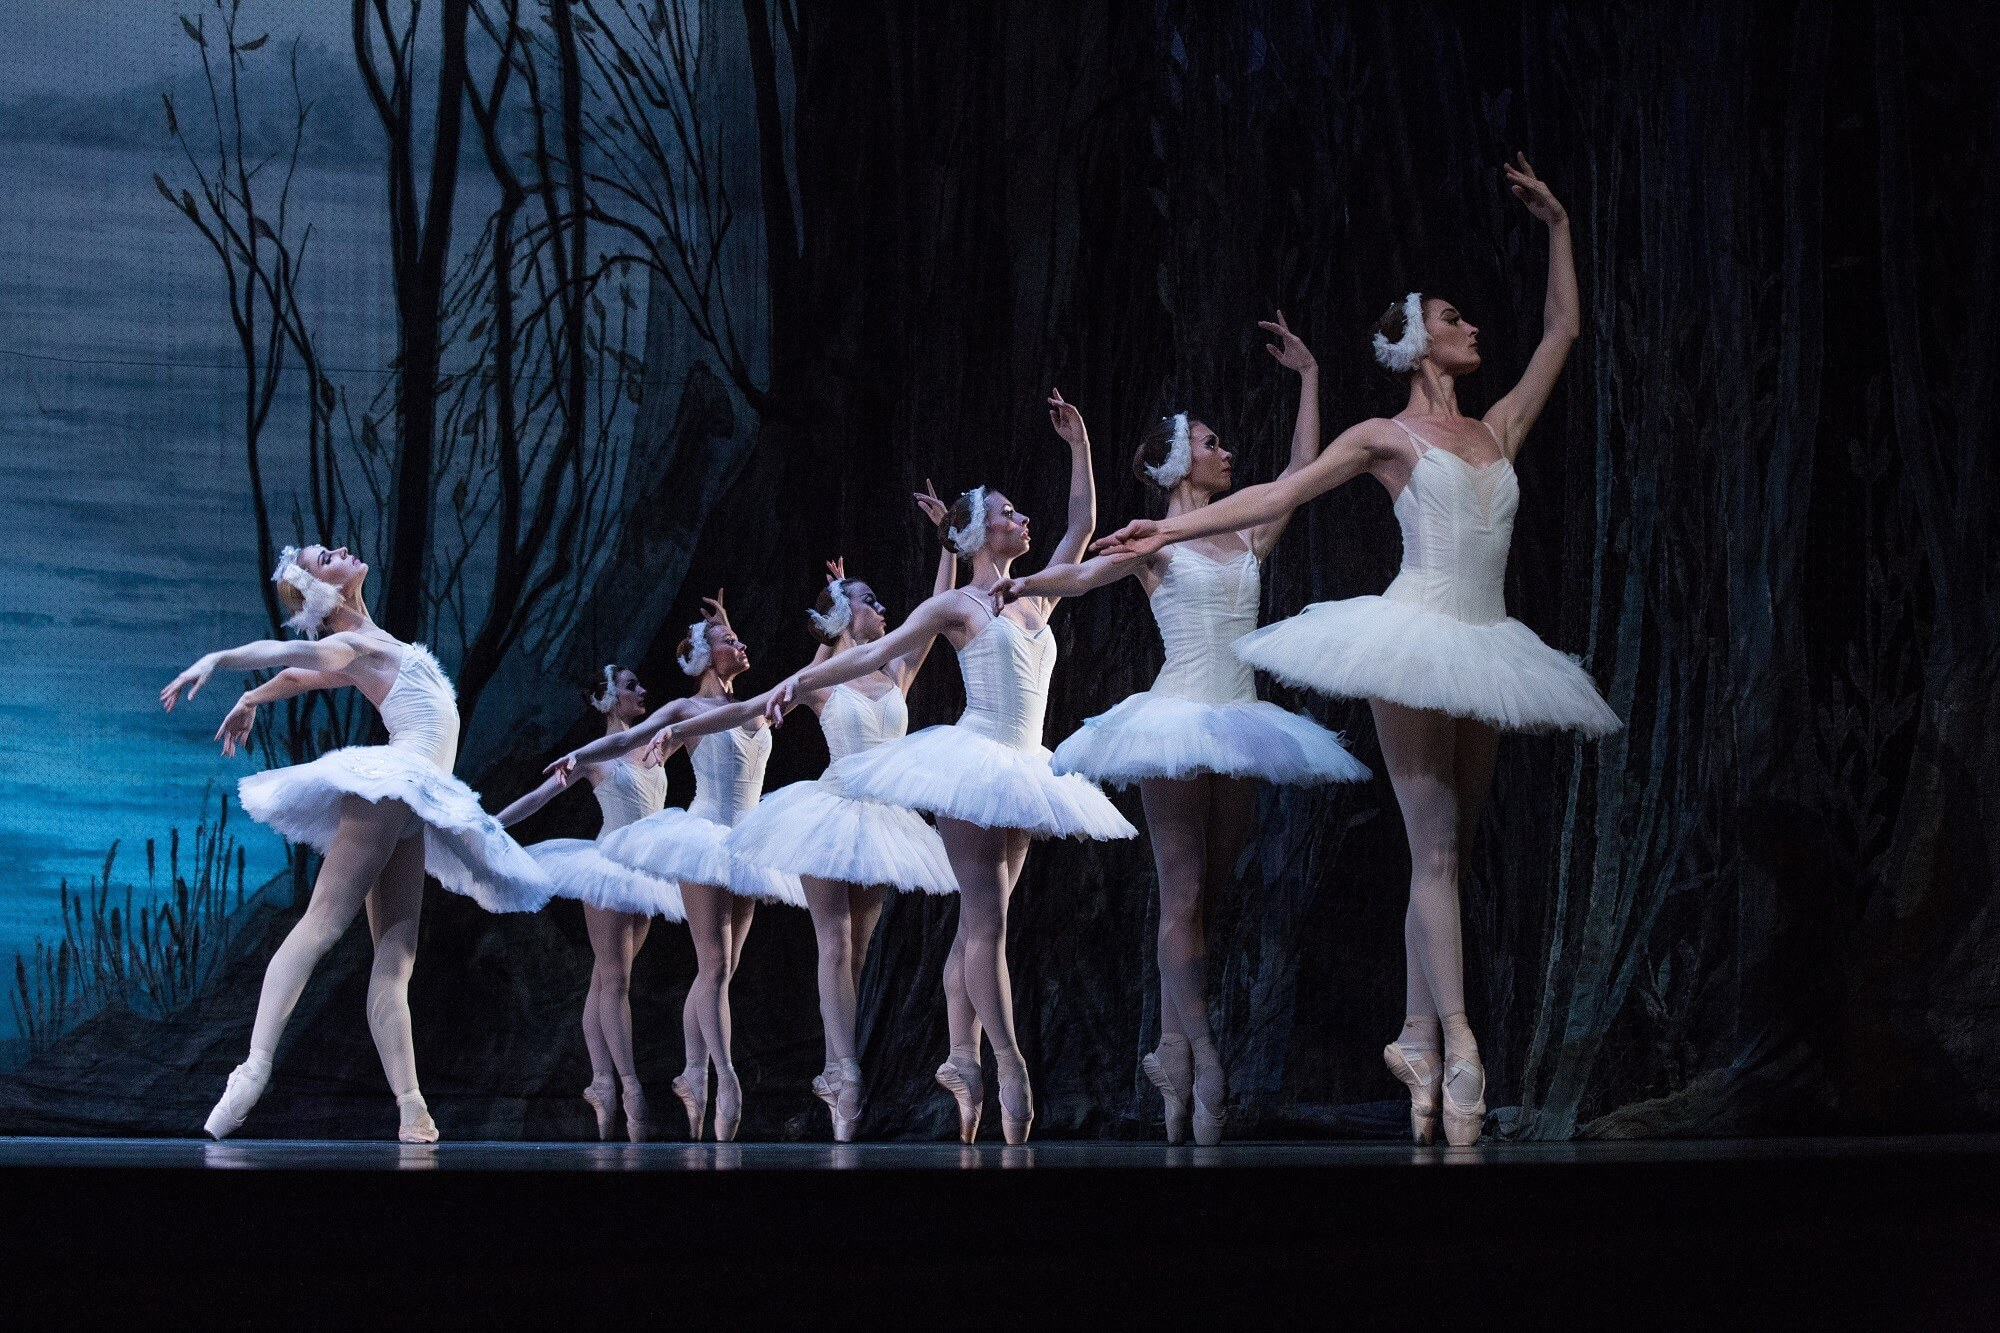 Charkov City Opera & Ballet